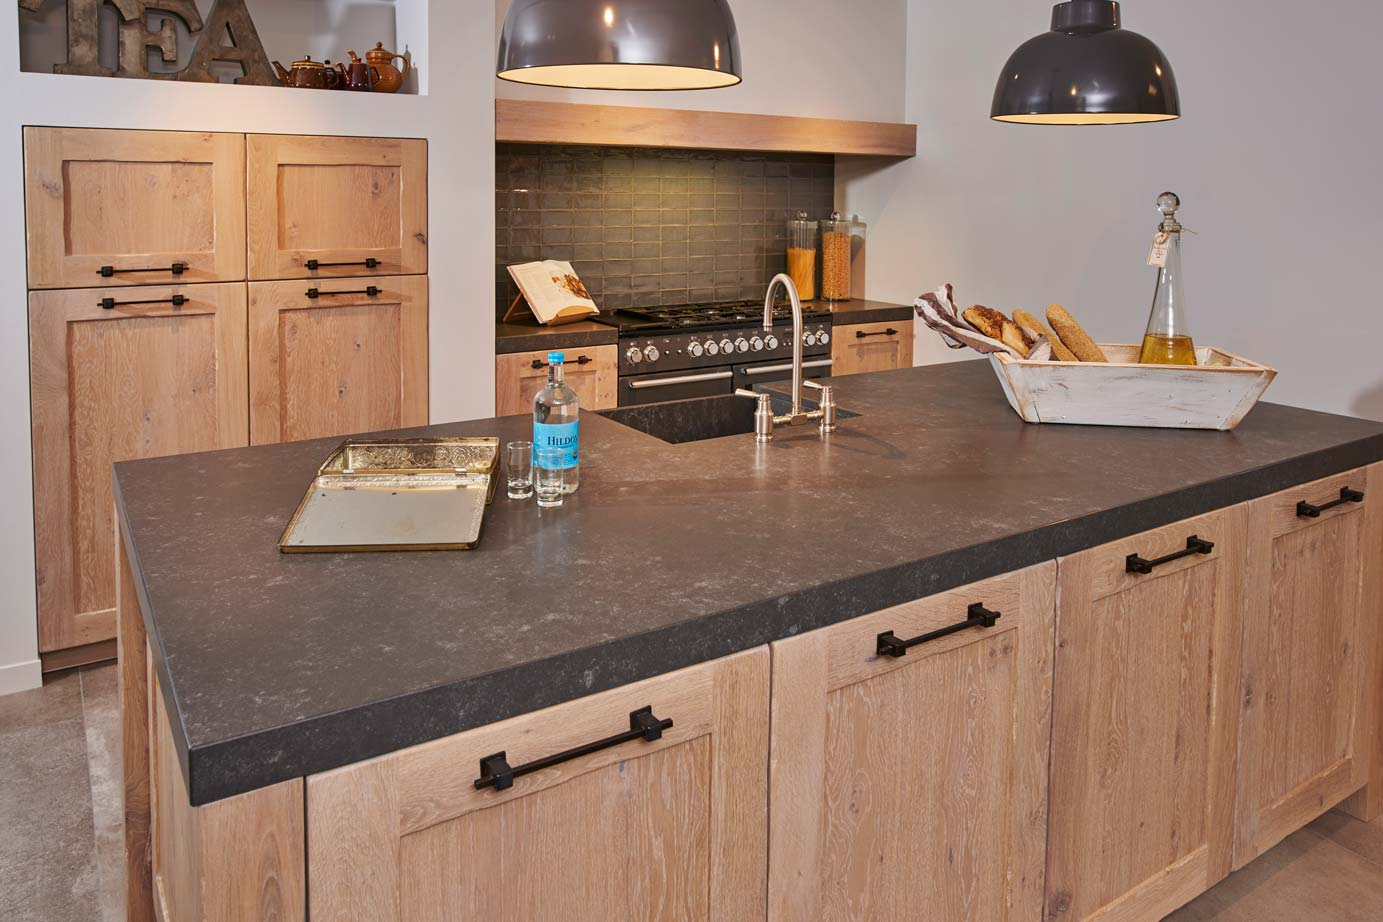 Prachtige houten keuken met spoeleiland! DB Keukens